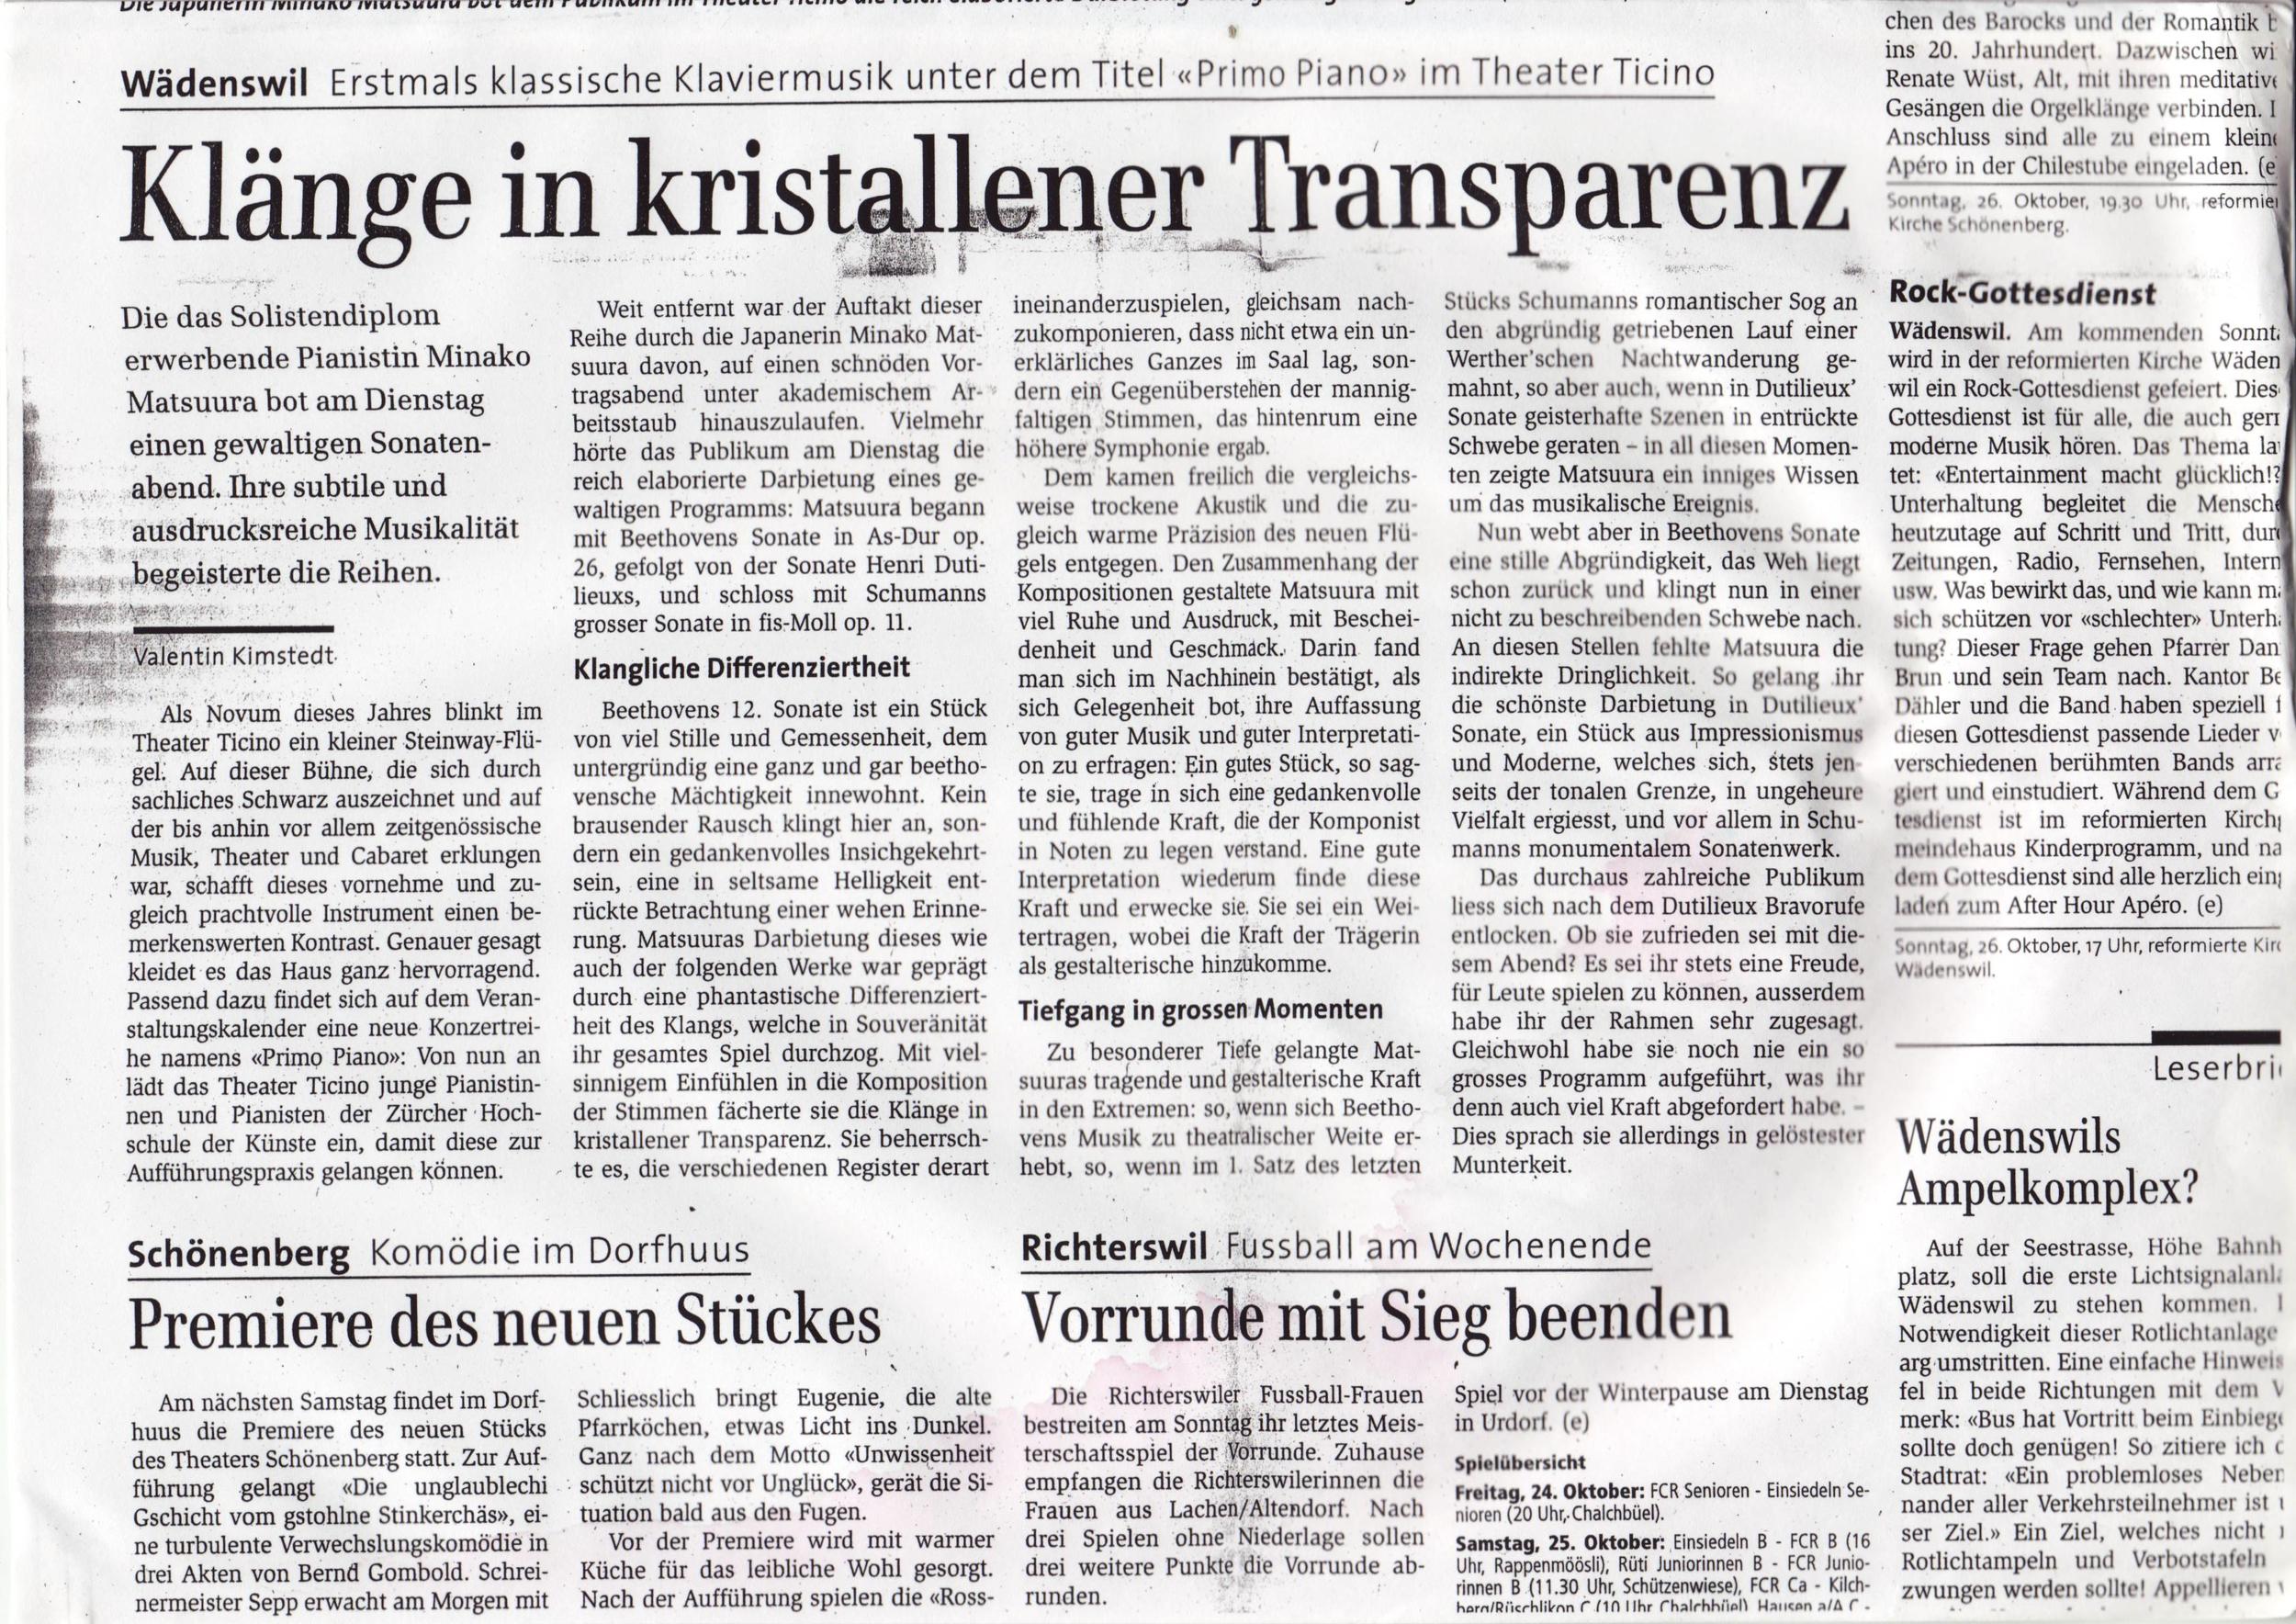 Zürichsee Zeitung 23.Oktober 2008 (Text).jpg